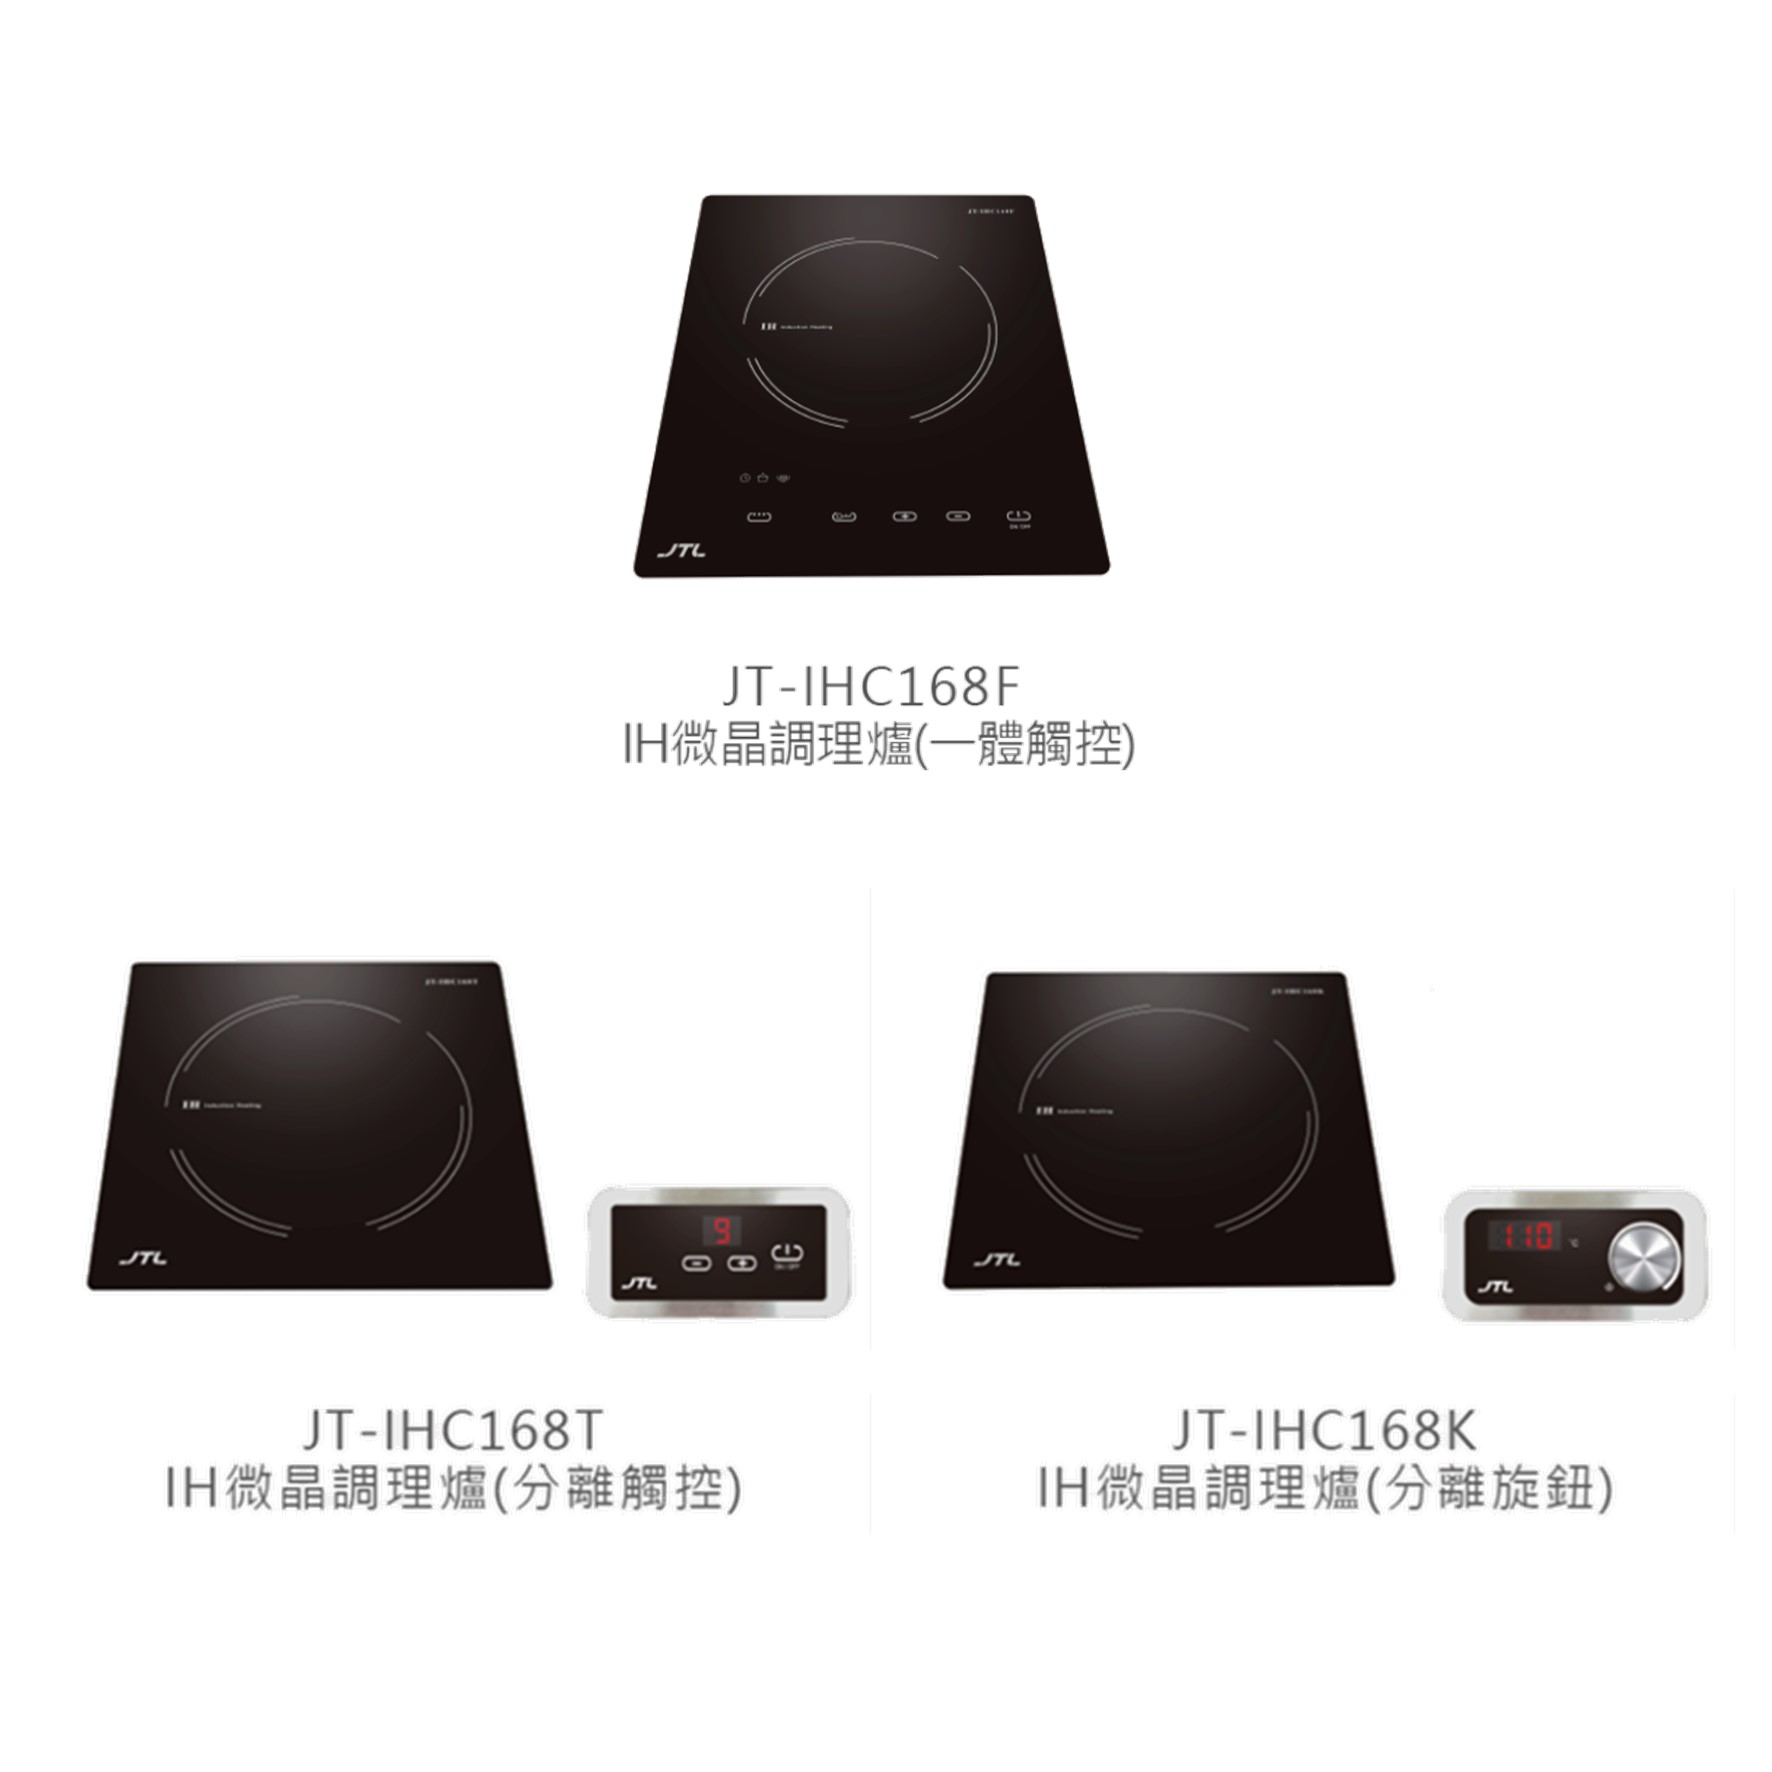 IH微晶調理爐(F一體觸控、T分離觸控、K分離旋鈕)